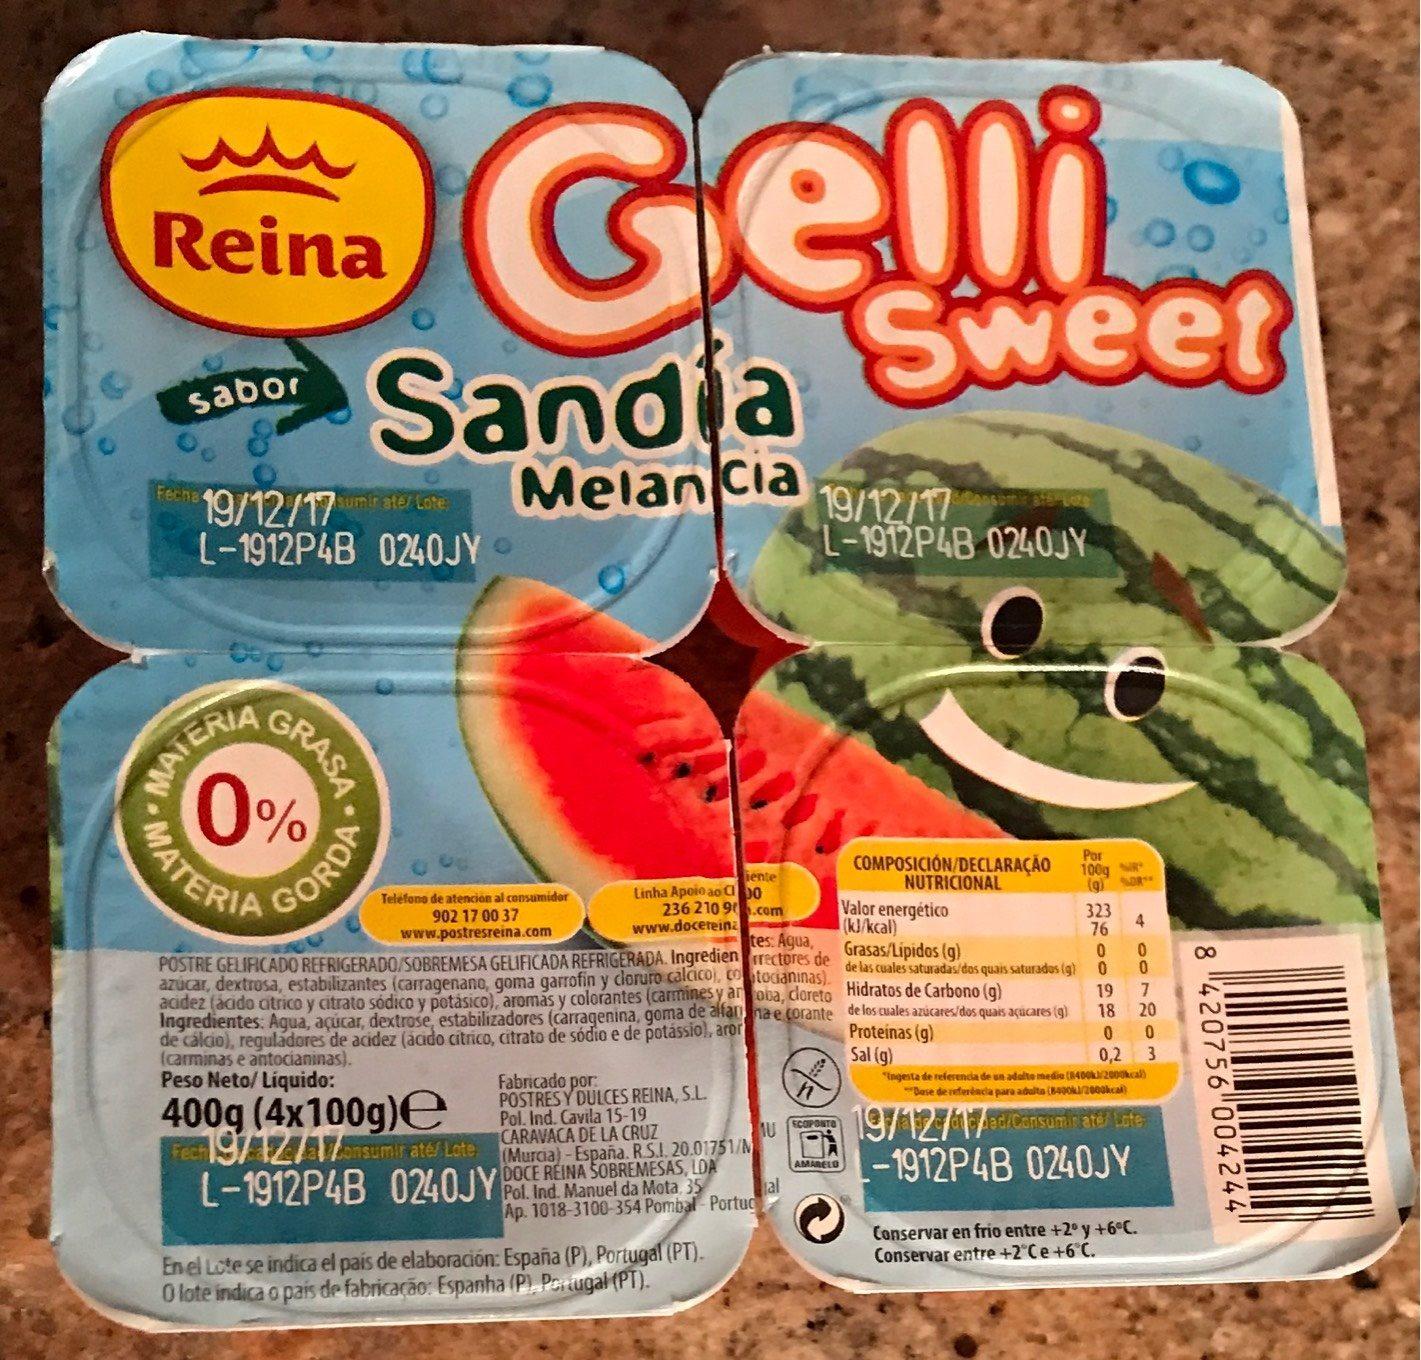 Gelli Sweet - Product